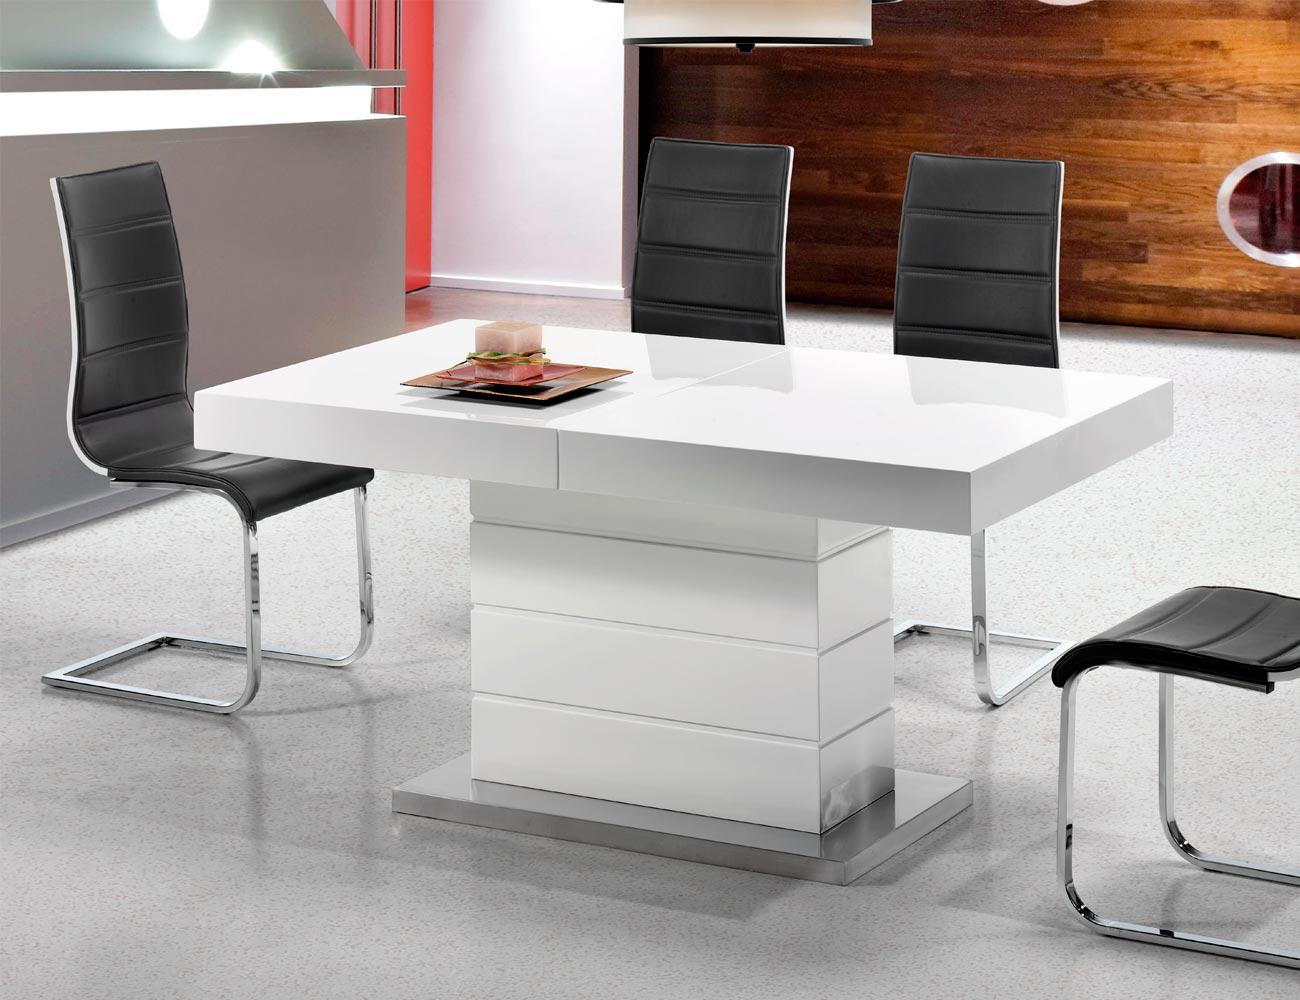 mesa de comedor en blanco alto brillo extensible de 150 a